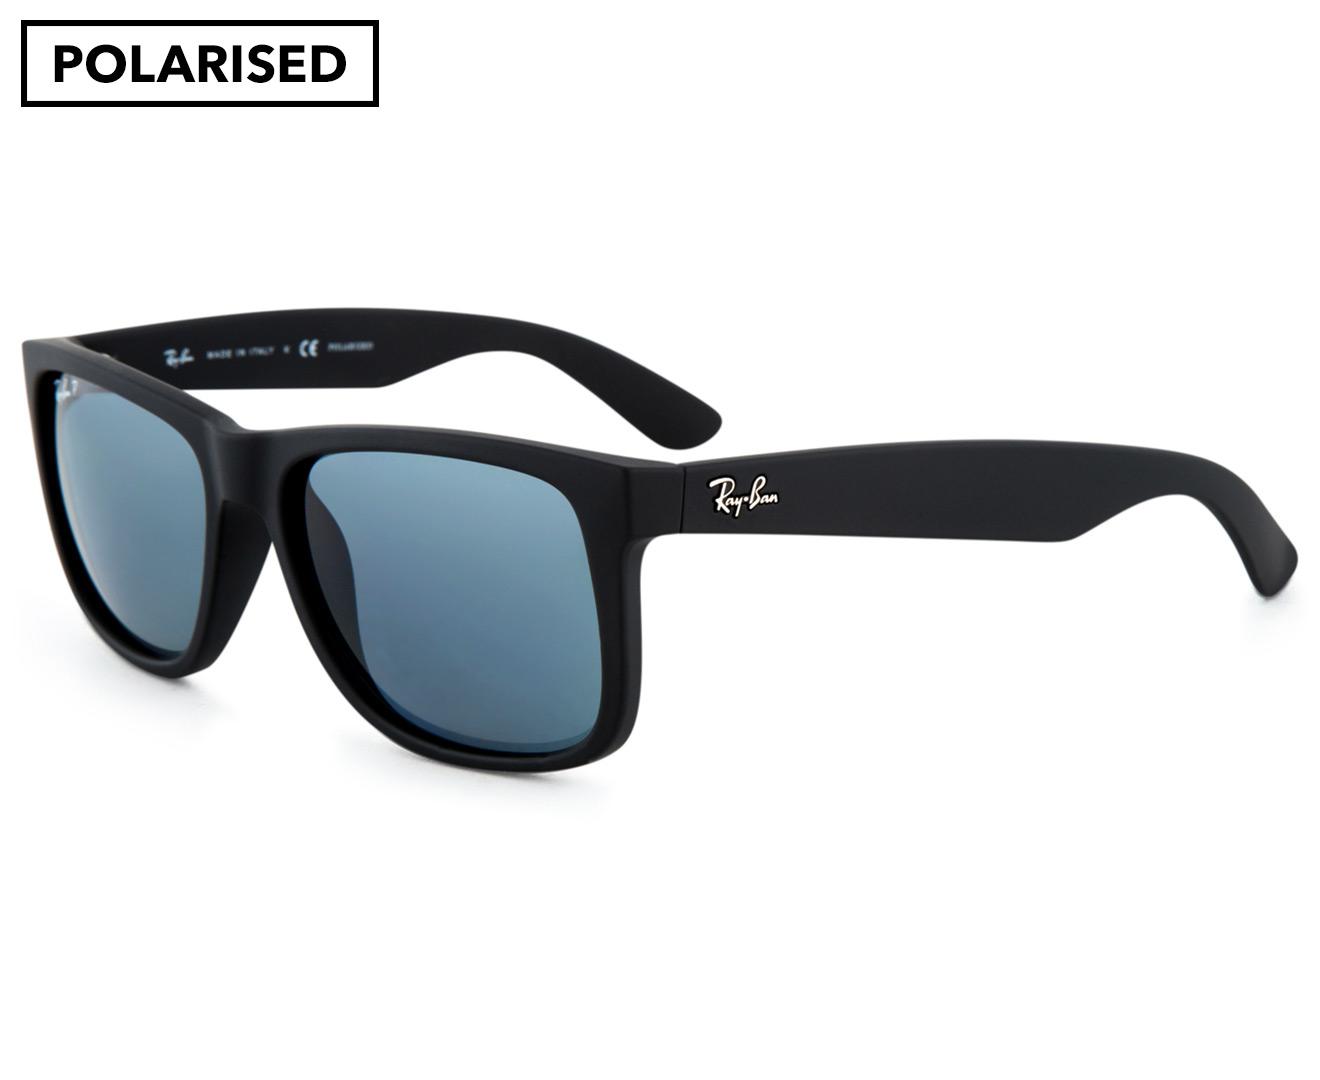 702213e65a Ray-Ban Justin RB4165 Polarised Sunglasses - Black Blue Classic ...